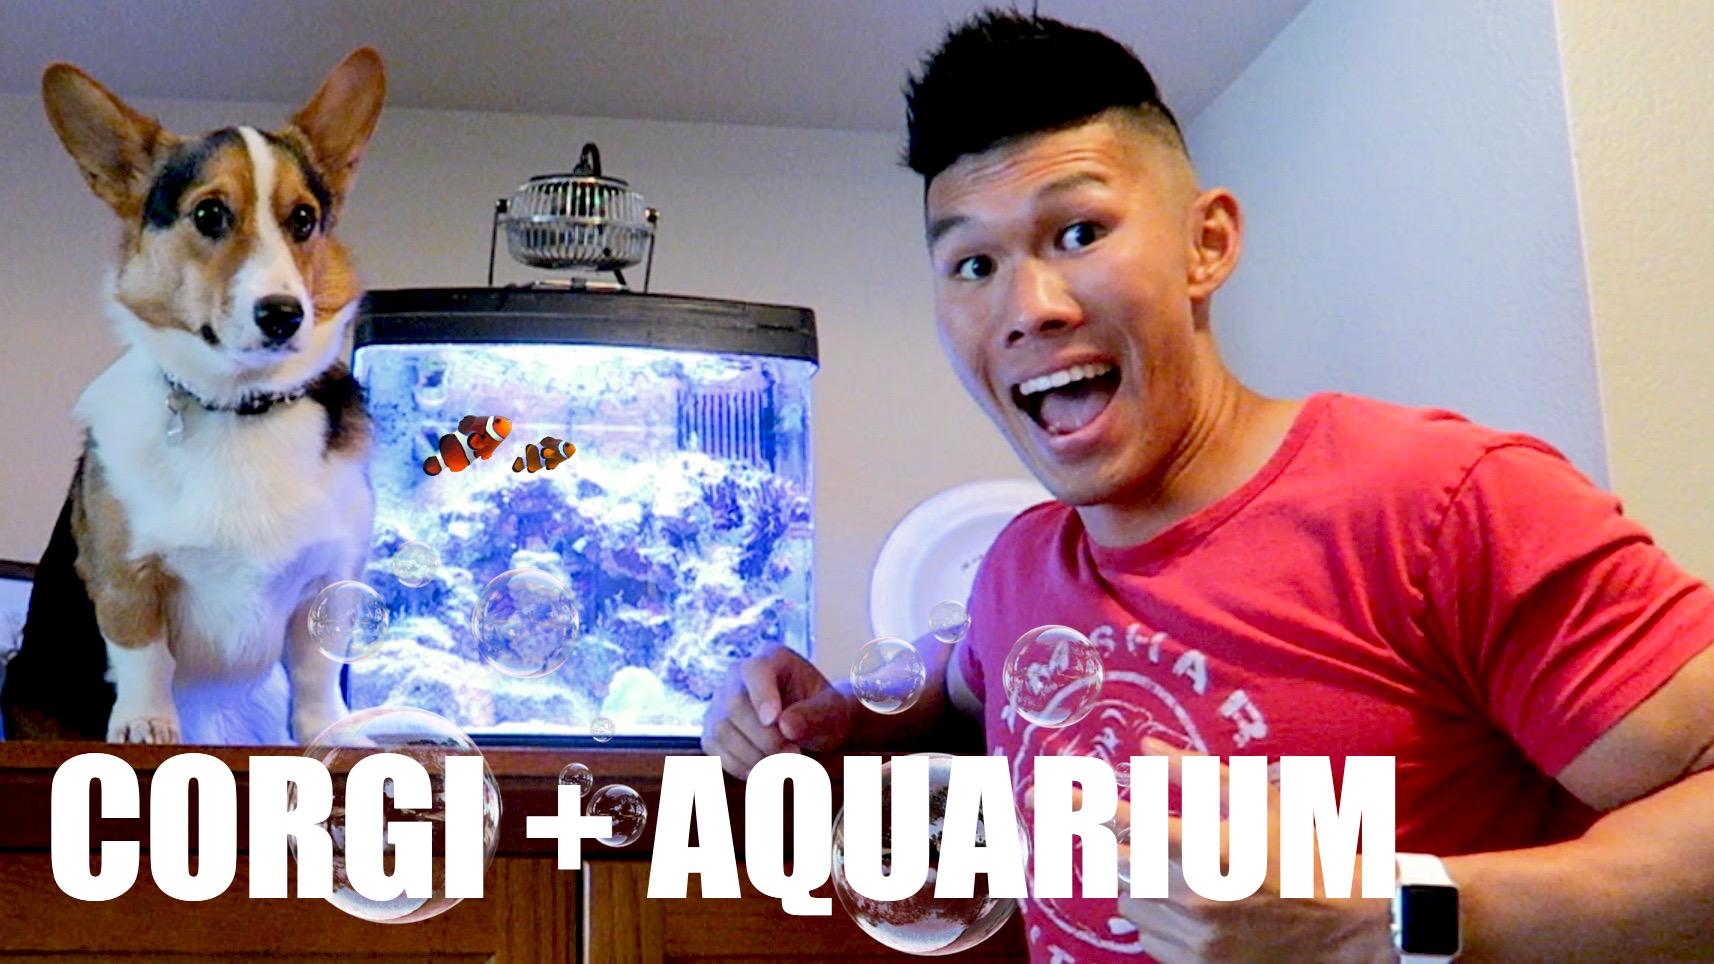 Corgi's Nano Reef Aquarium